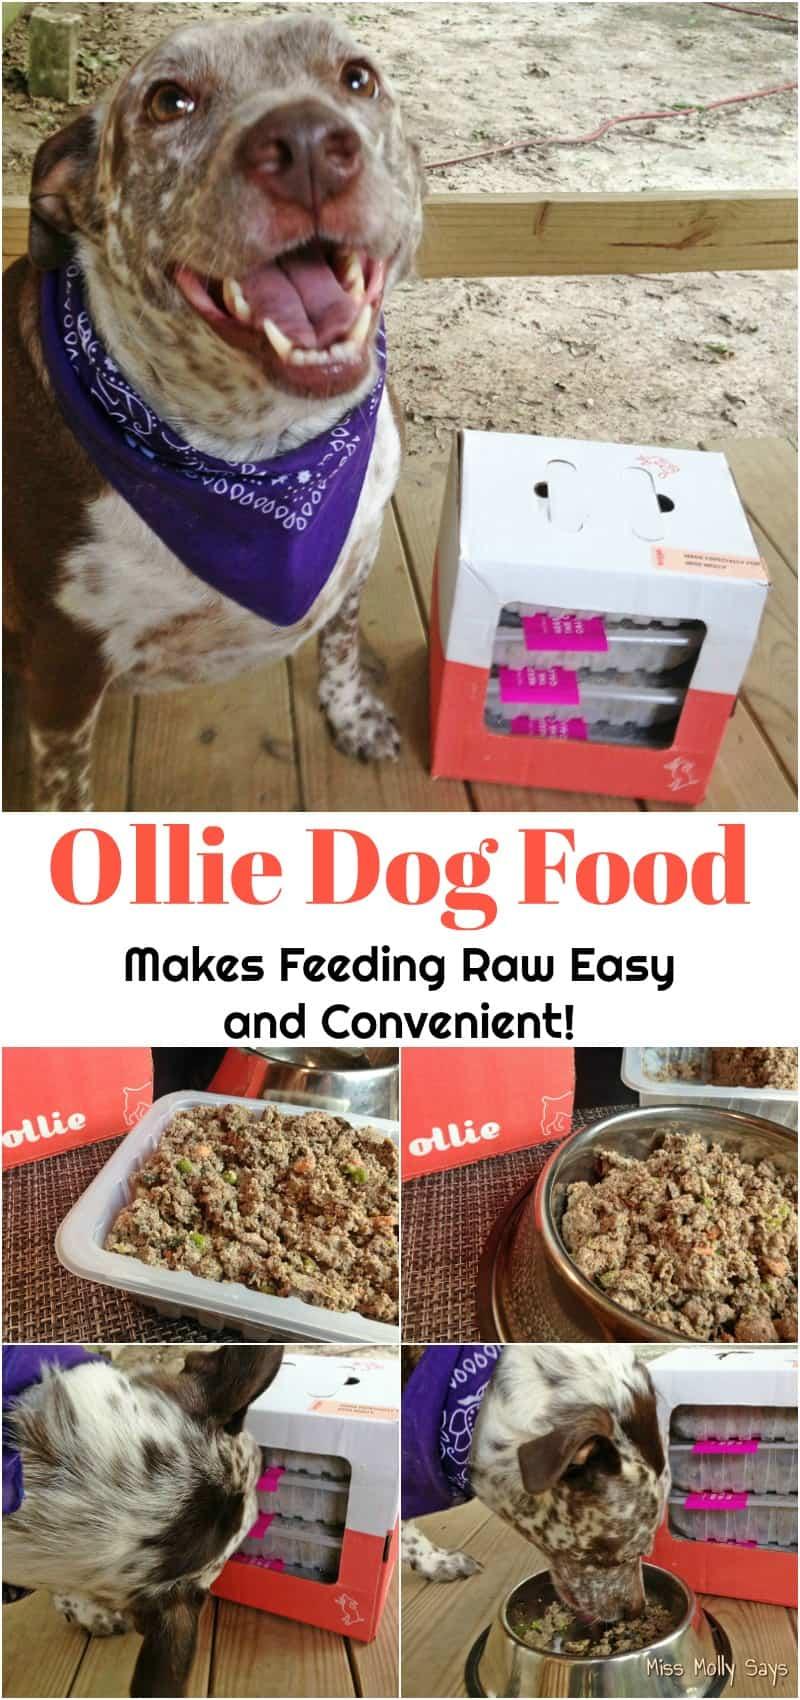 Ollie dog food makes feeding raw easy and convenient miss molly says ollie dog food makes feeding raw easy and convenient solutioingenieria Images